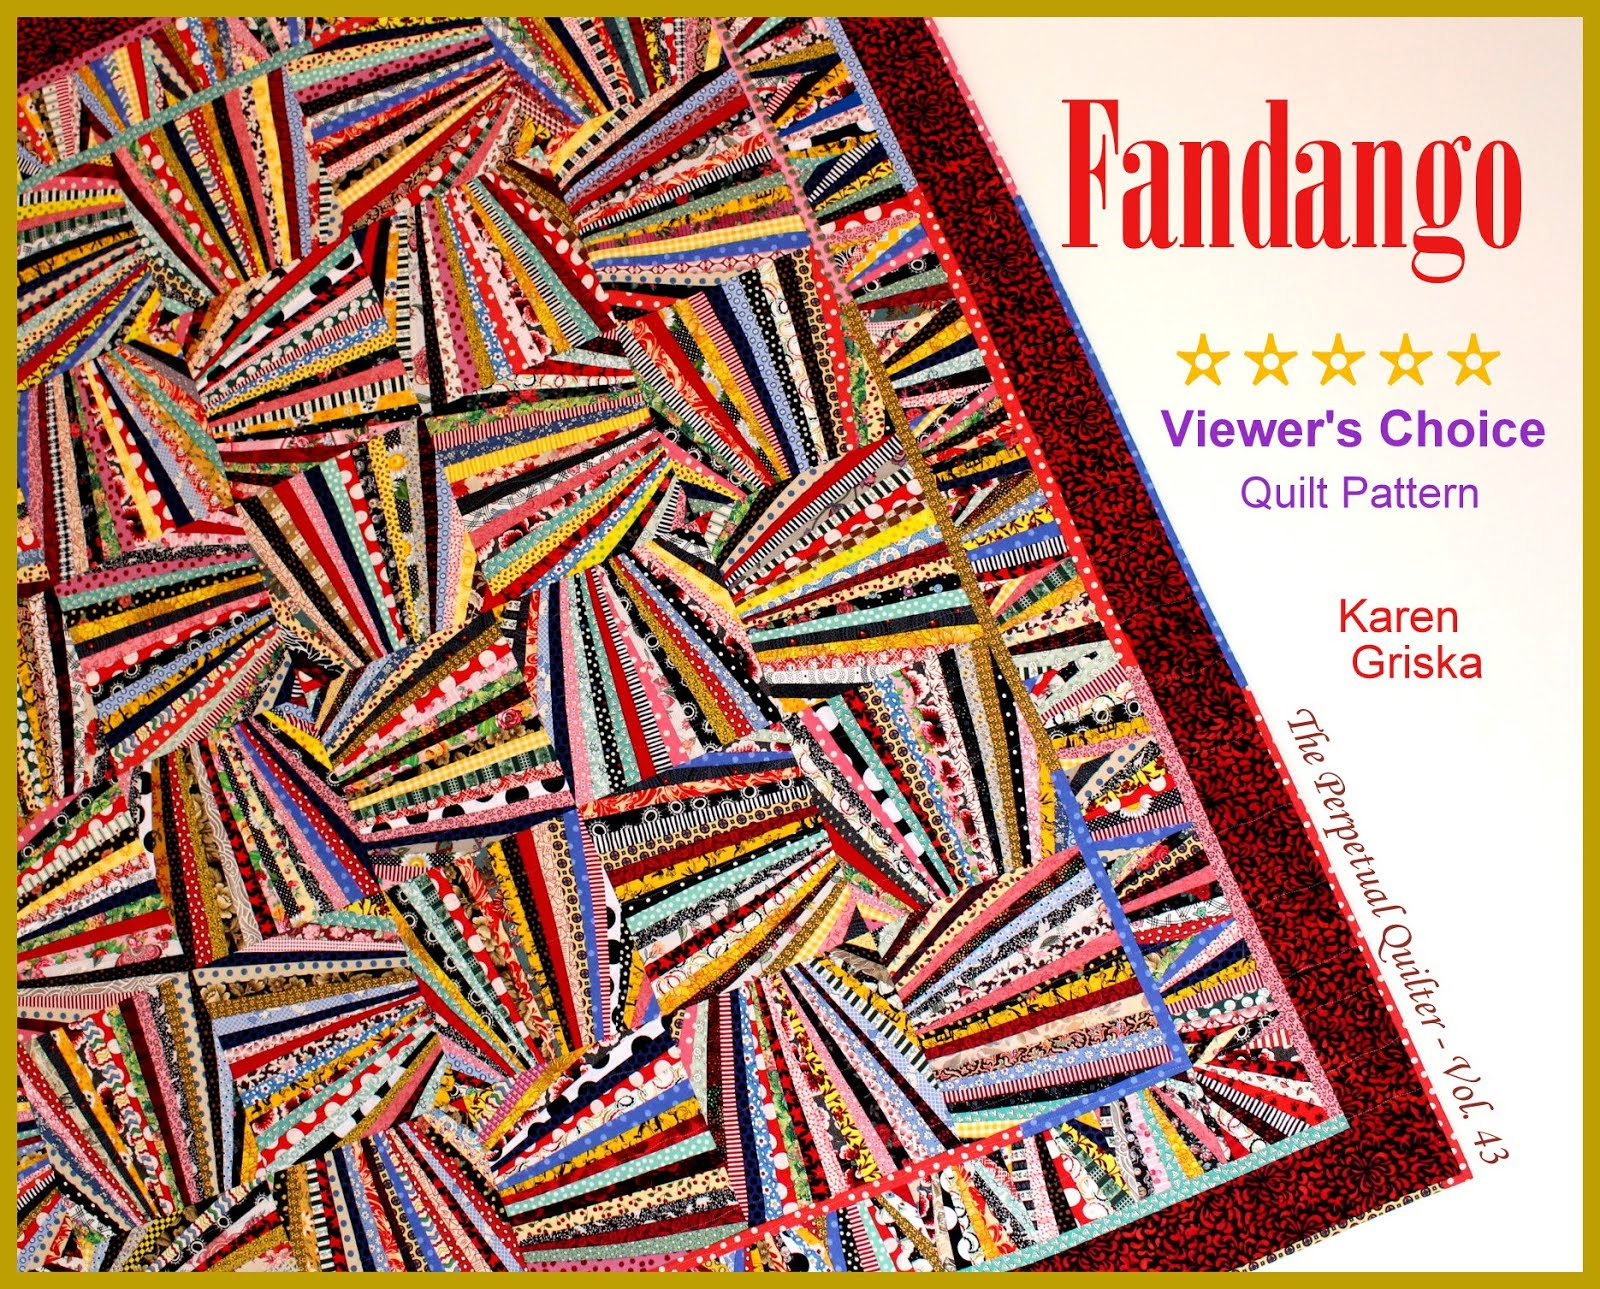 New Fandango Quilt Pattern!